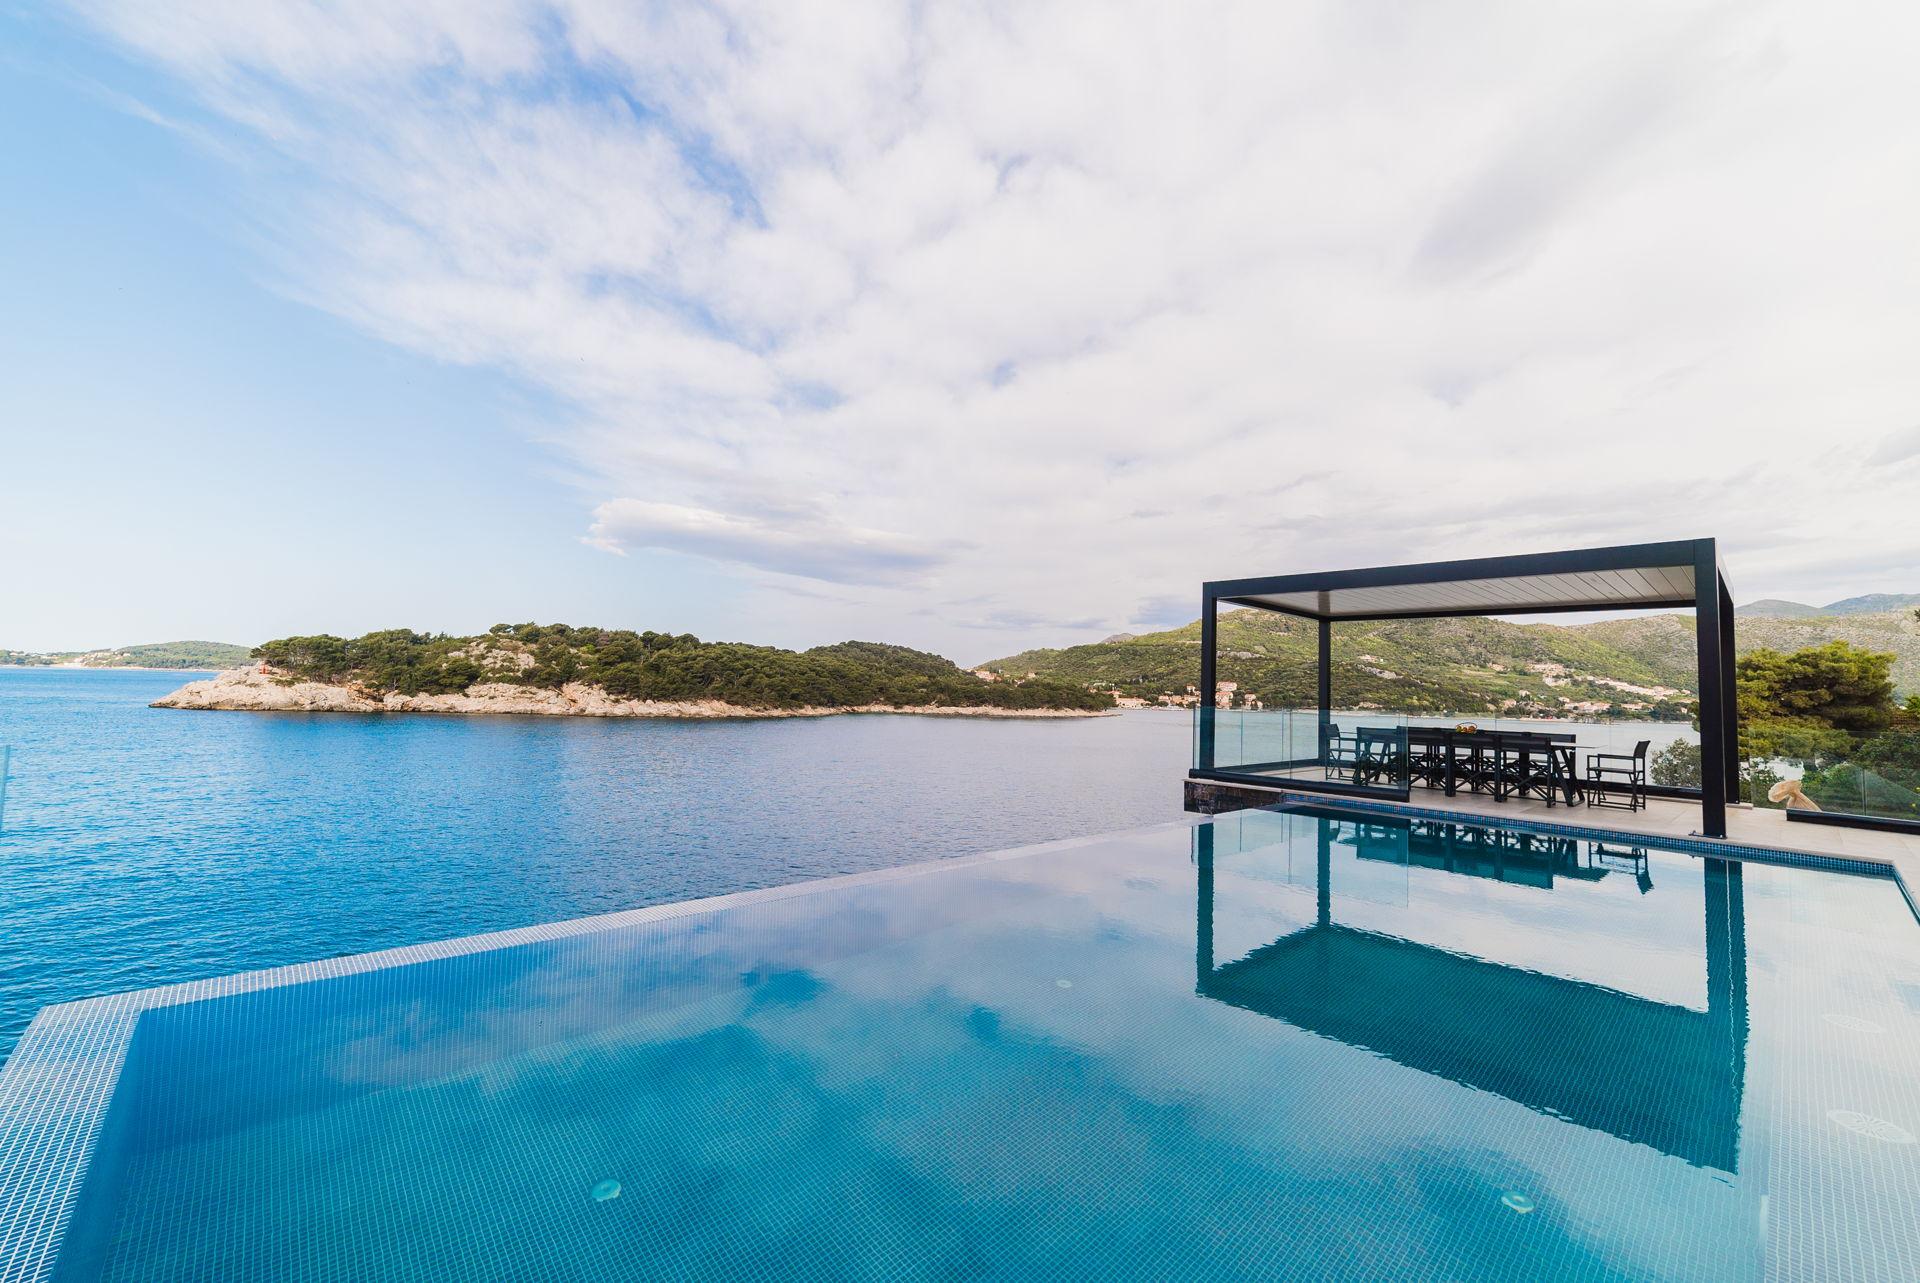 Grand Oceania Infinity Pool View